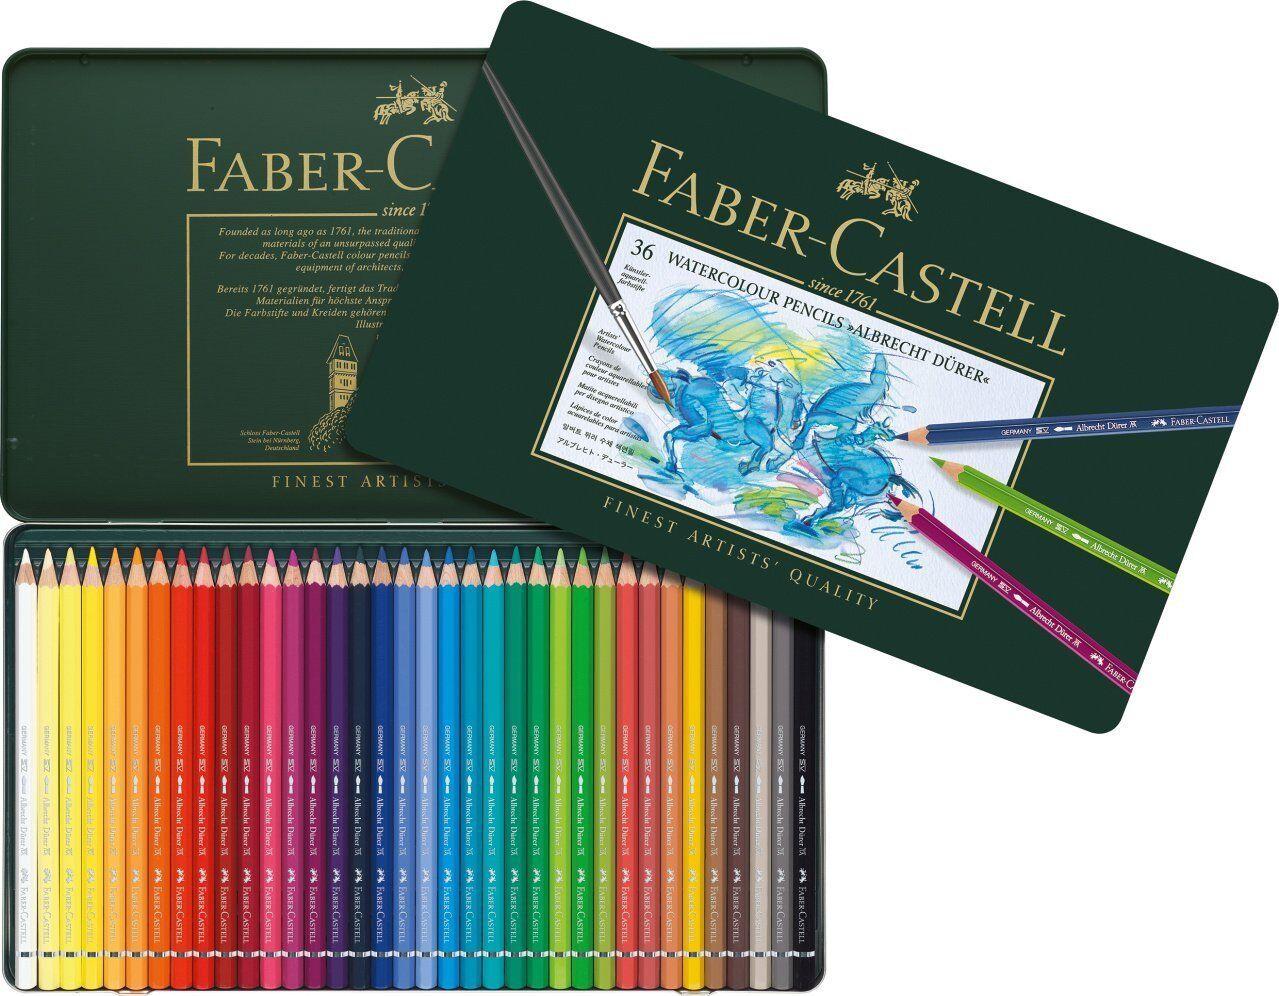 Faber Castell 117536 Aquarellstift Albrecht Dürer 36 Metalletui | Vollständige Spezifikation  | Produktqualität  | New Product 2019